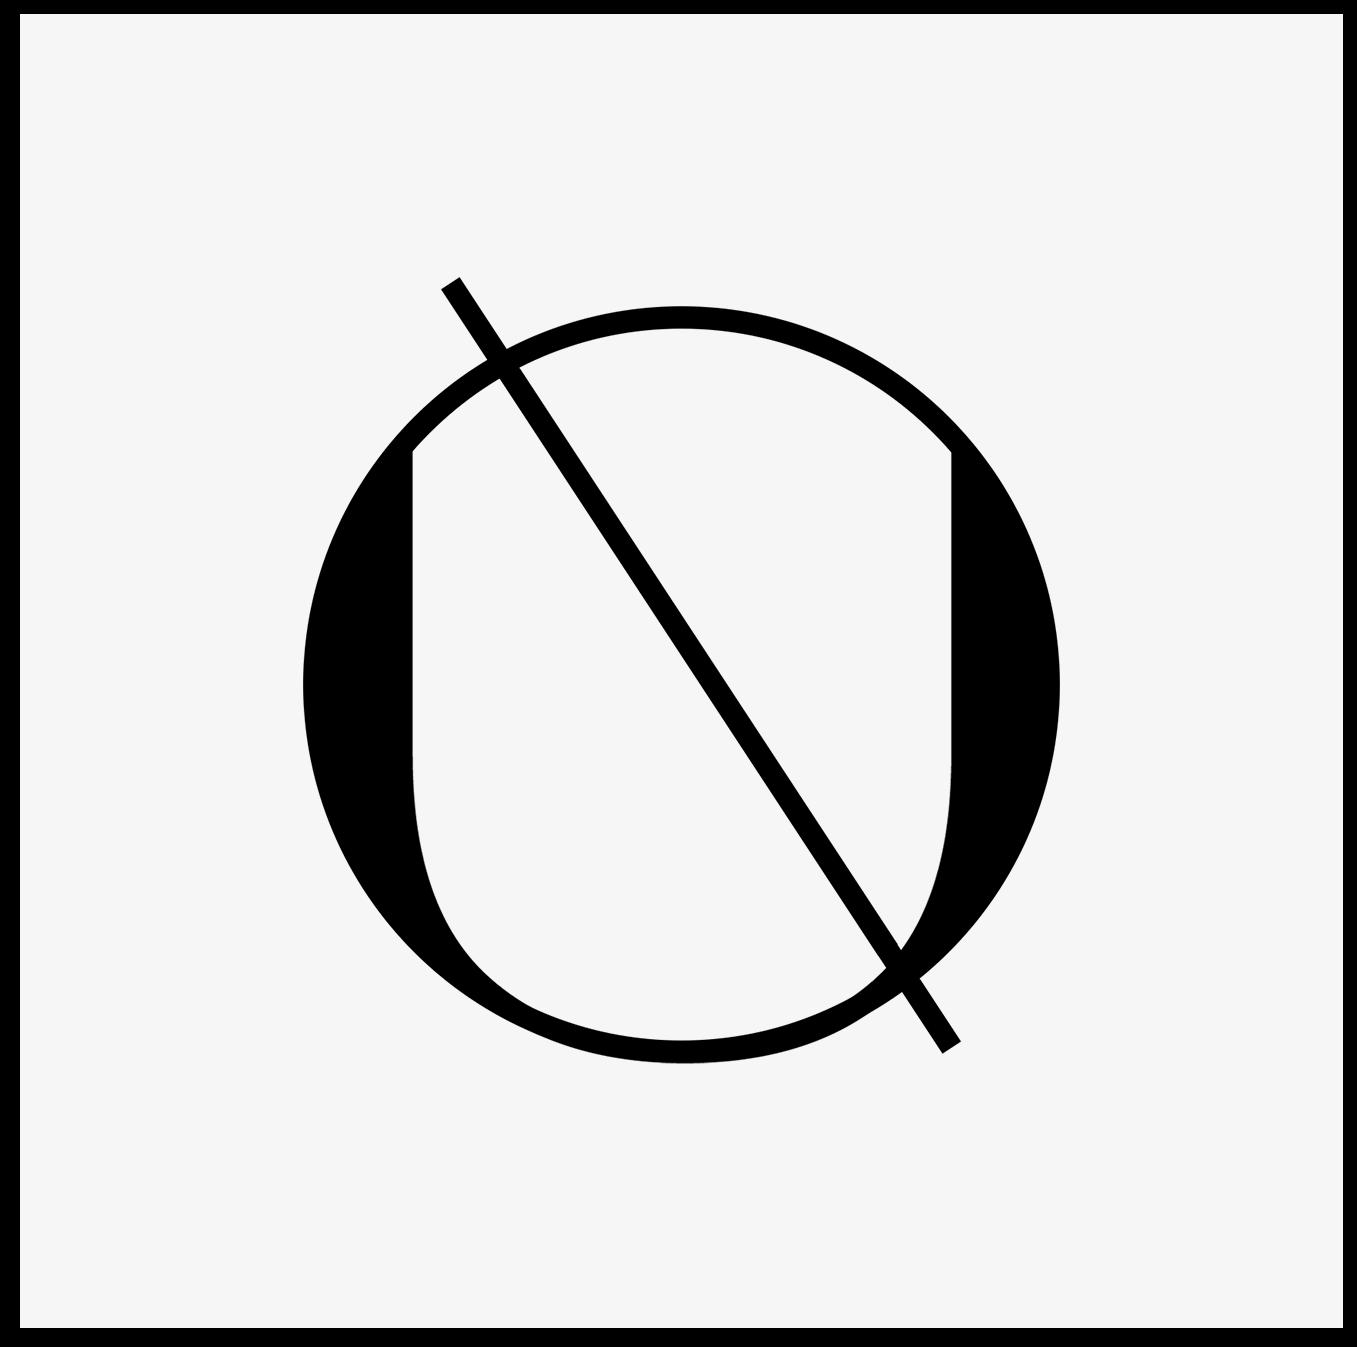 Logo cirkel wit op zwart